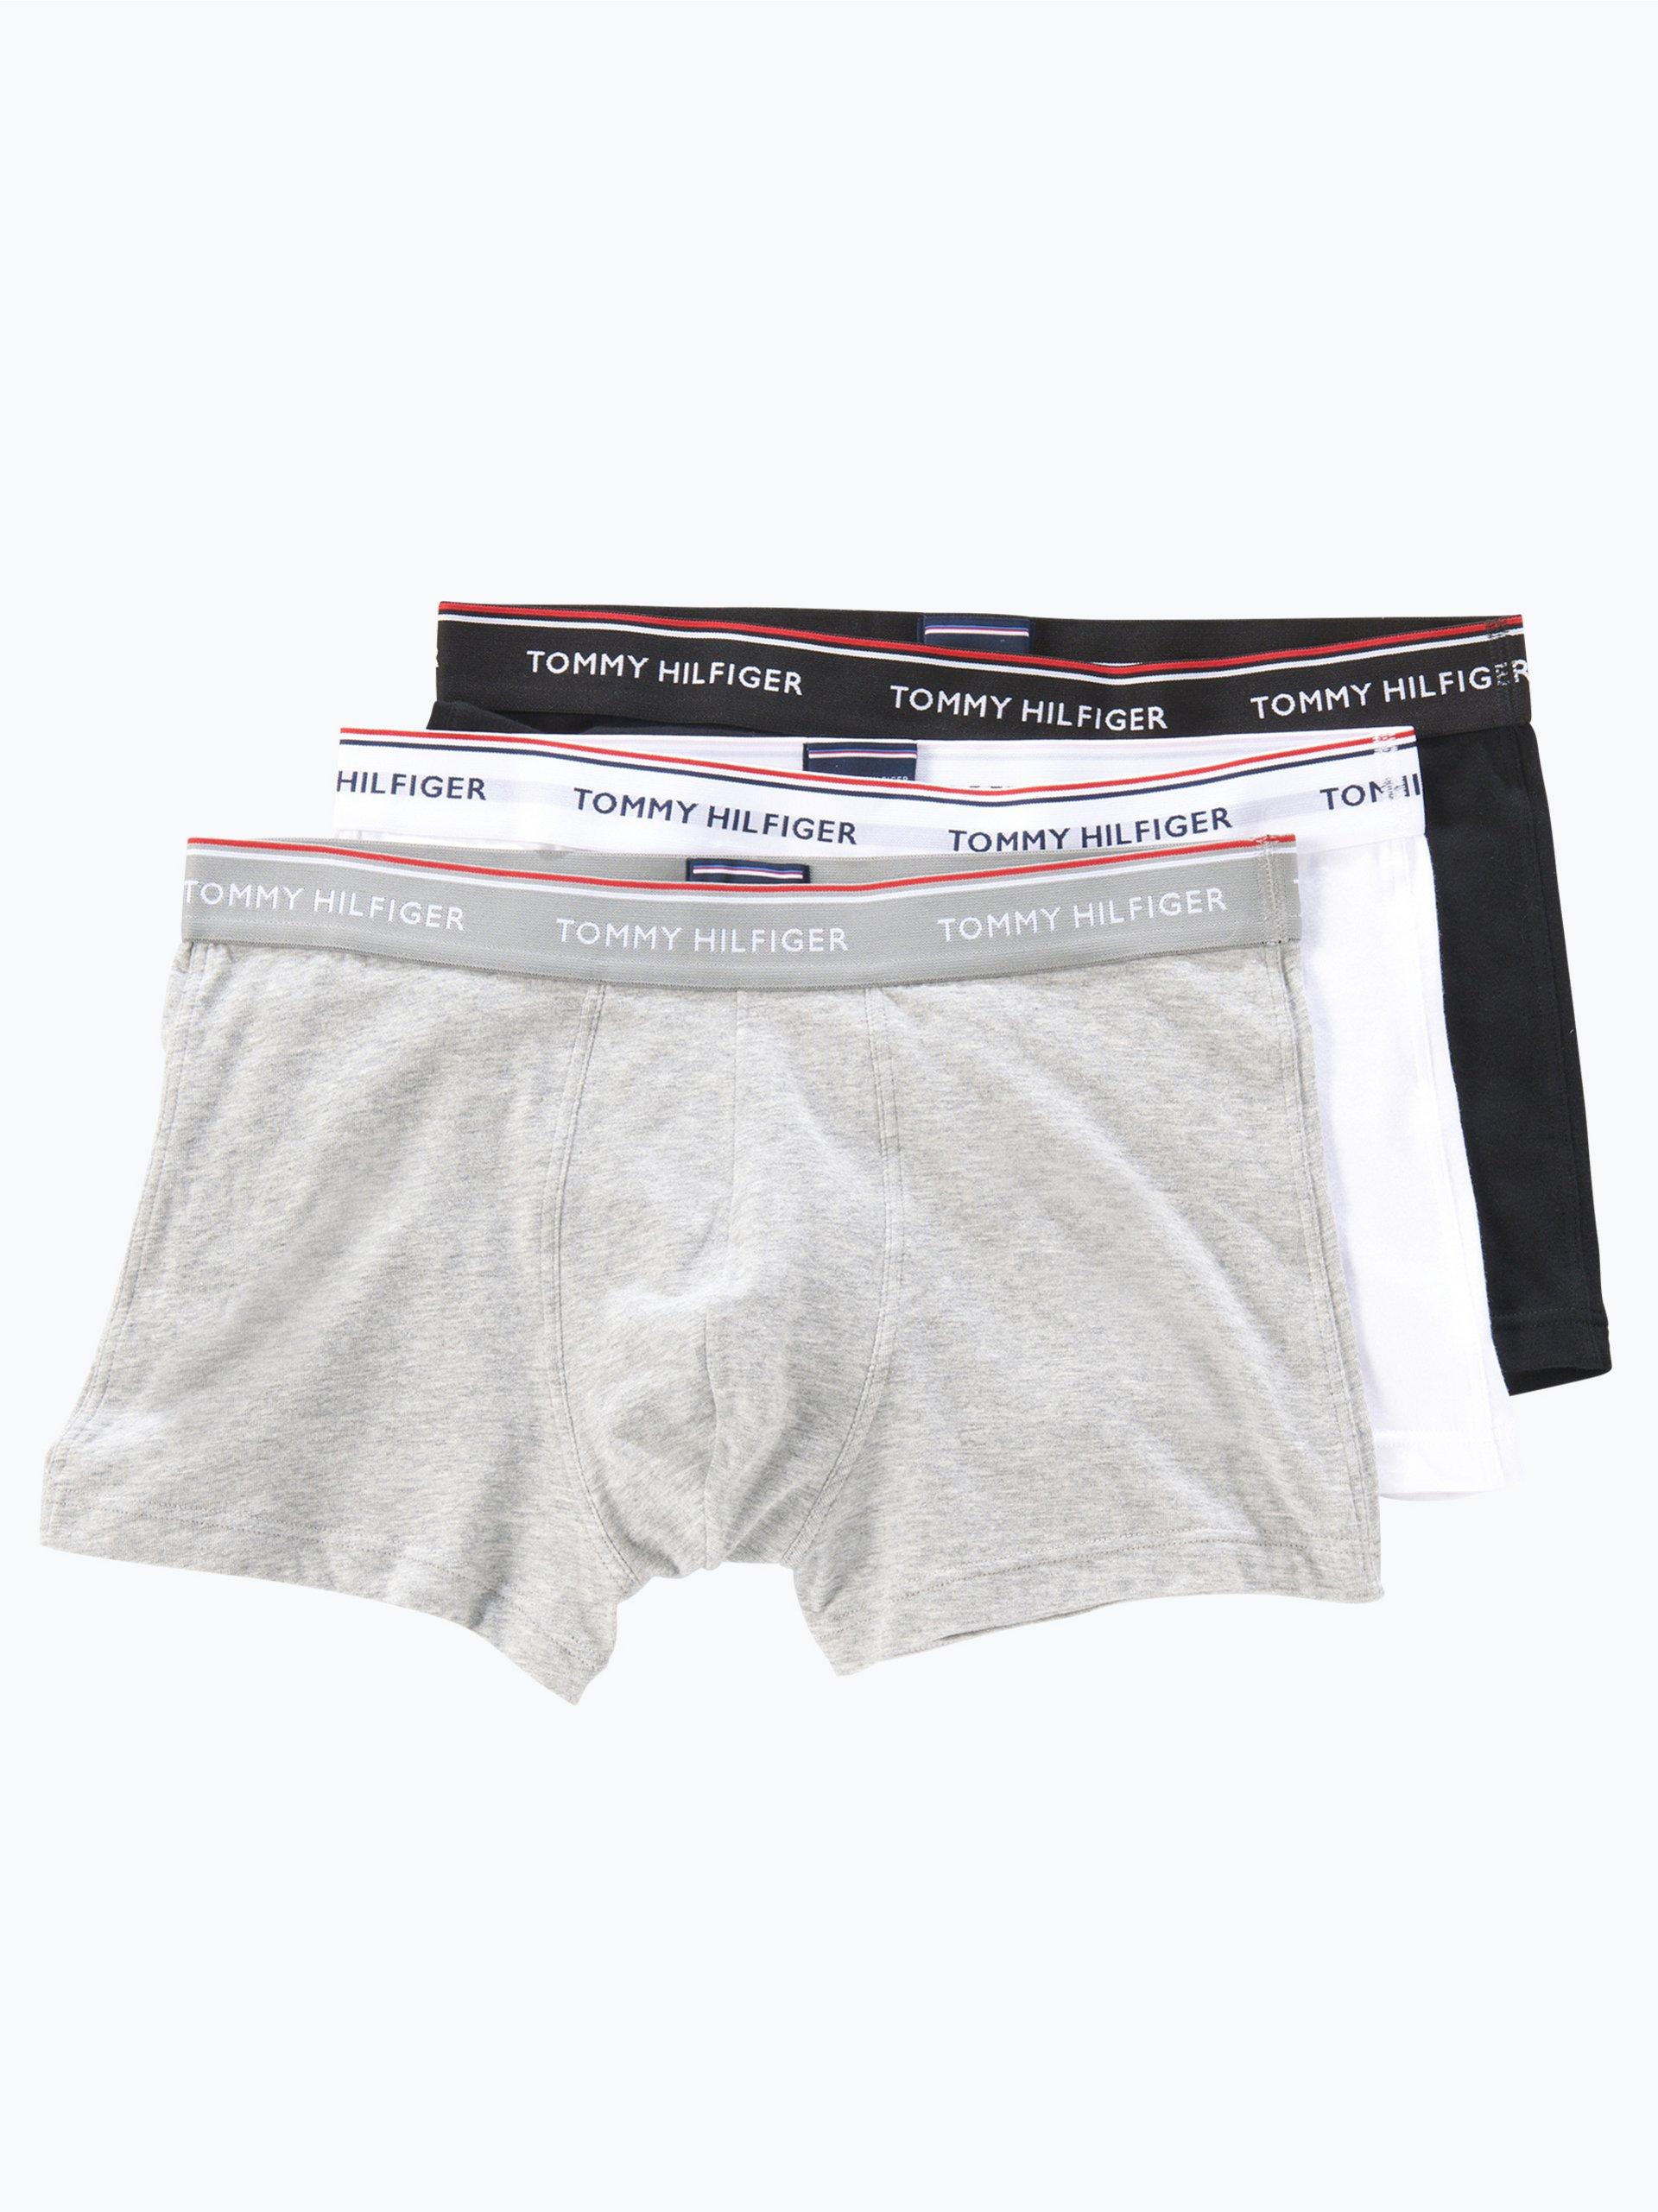 Tommy Hilfiger Obcisłe bokserki męskie – bawełna ze stretchem pakowane po 3 szt.